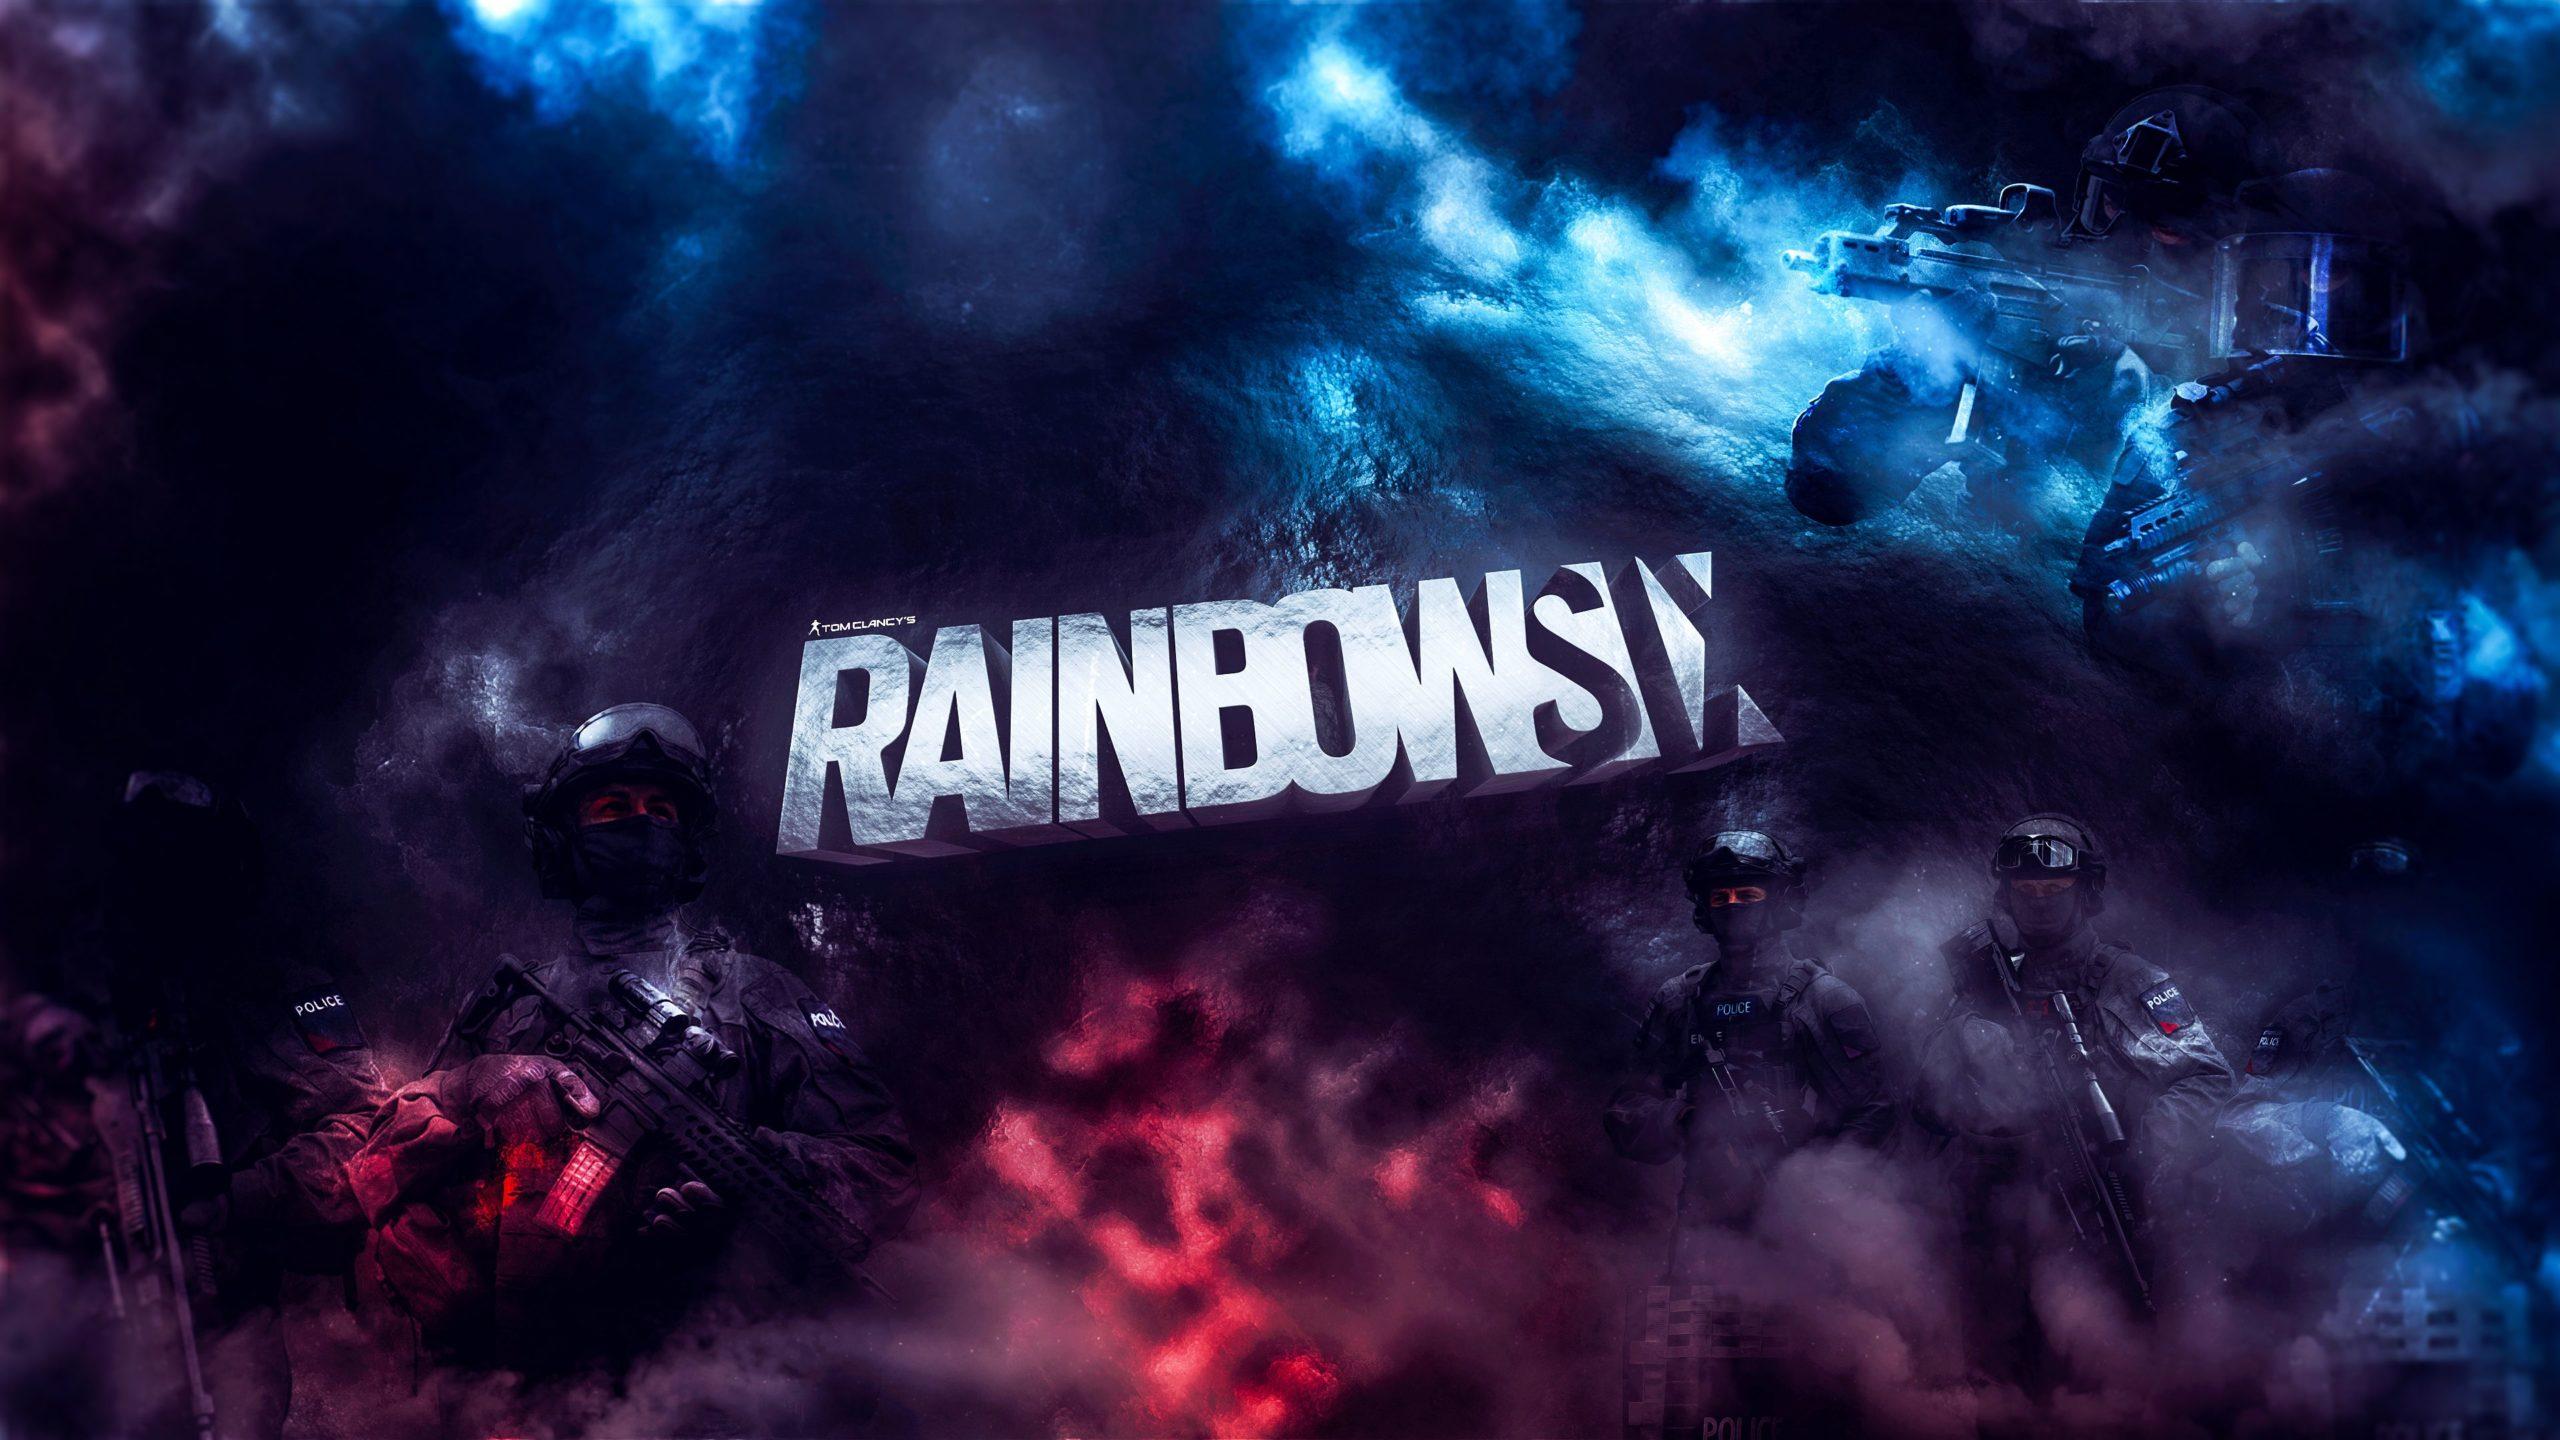 Rainbow Six Siege Wallpaper   EnJpg 2560x1440